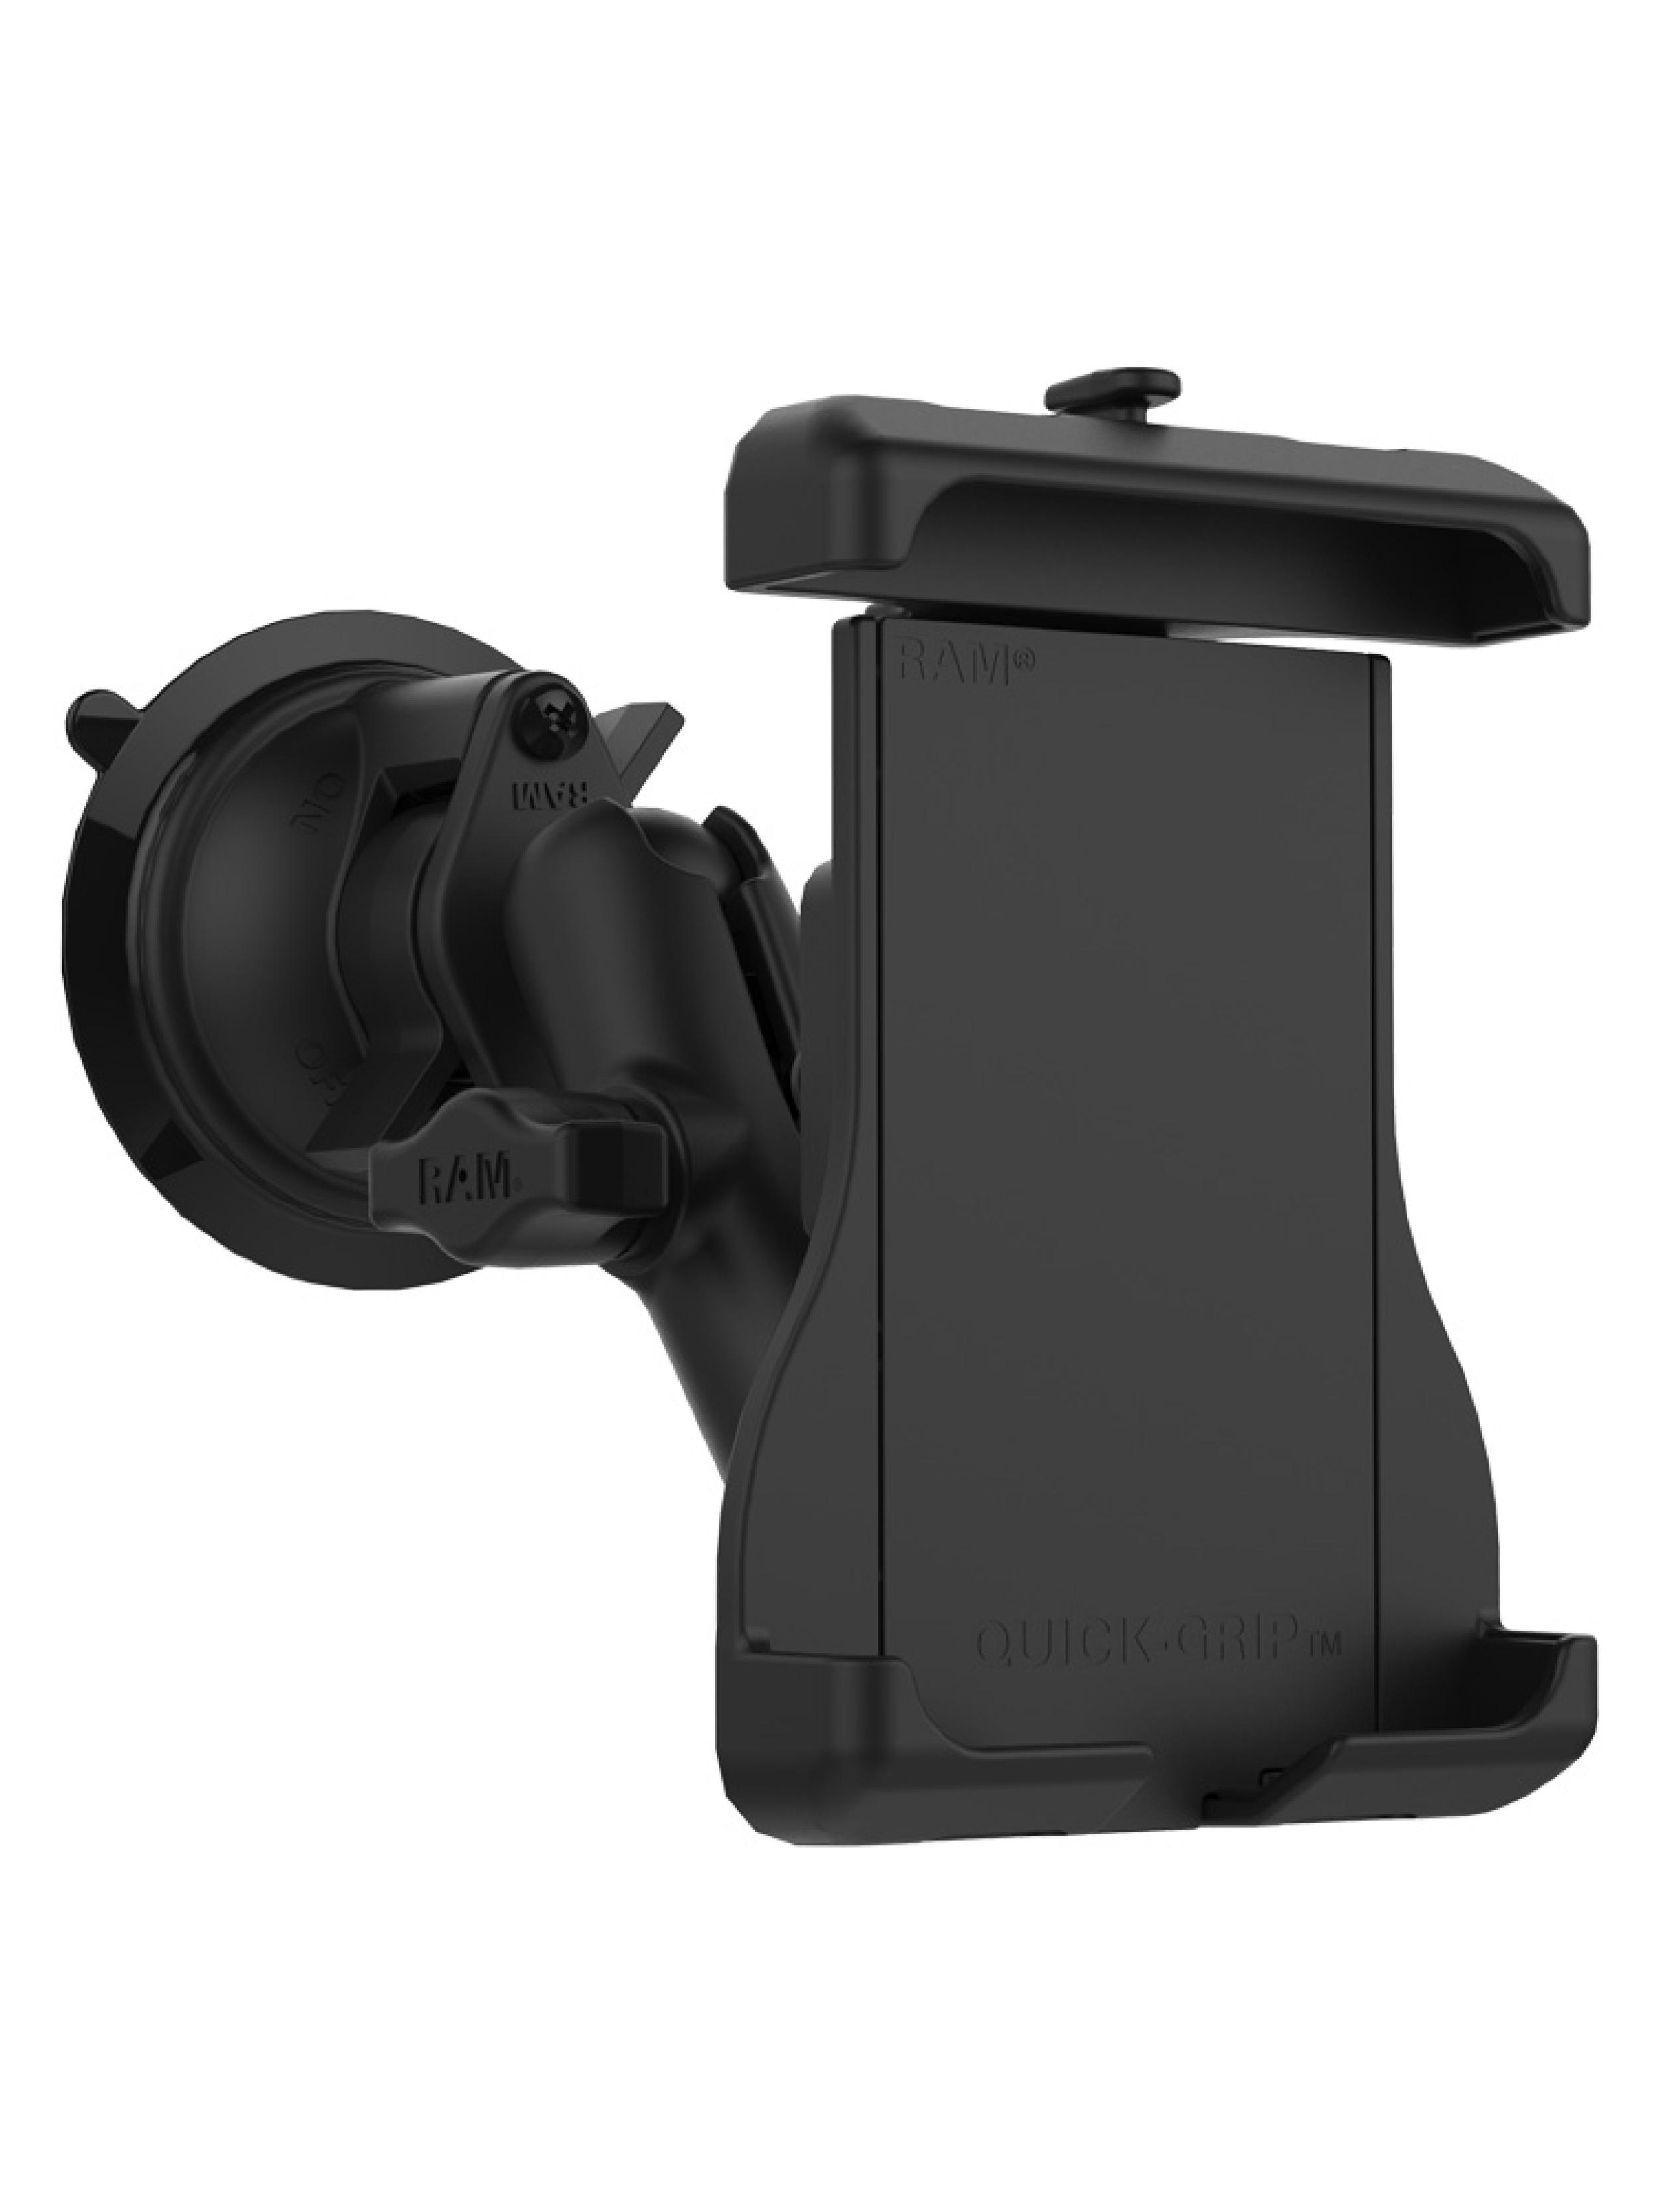 RAM Mounts Saugfuss-Halterung mit Quick-Grip Halteschale für Apple MagSafe kompatible Smartphones - B-Kugel (1 Zoll)